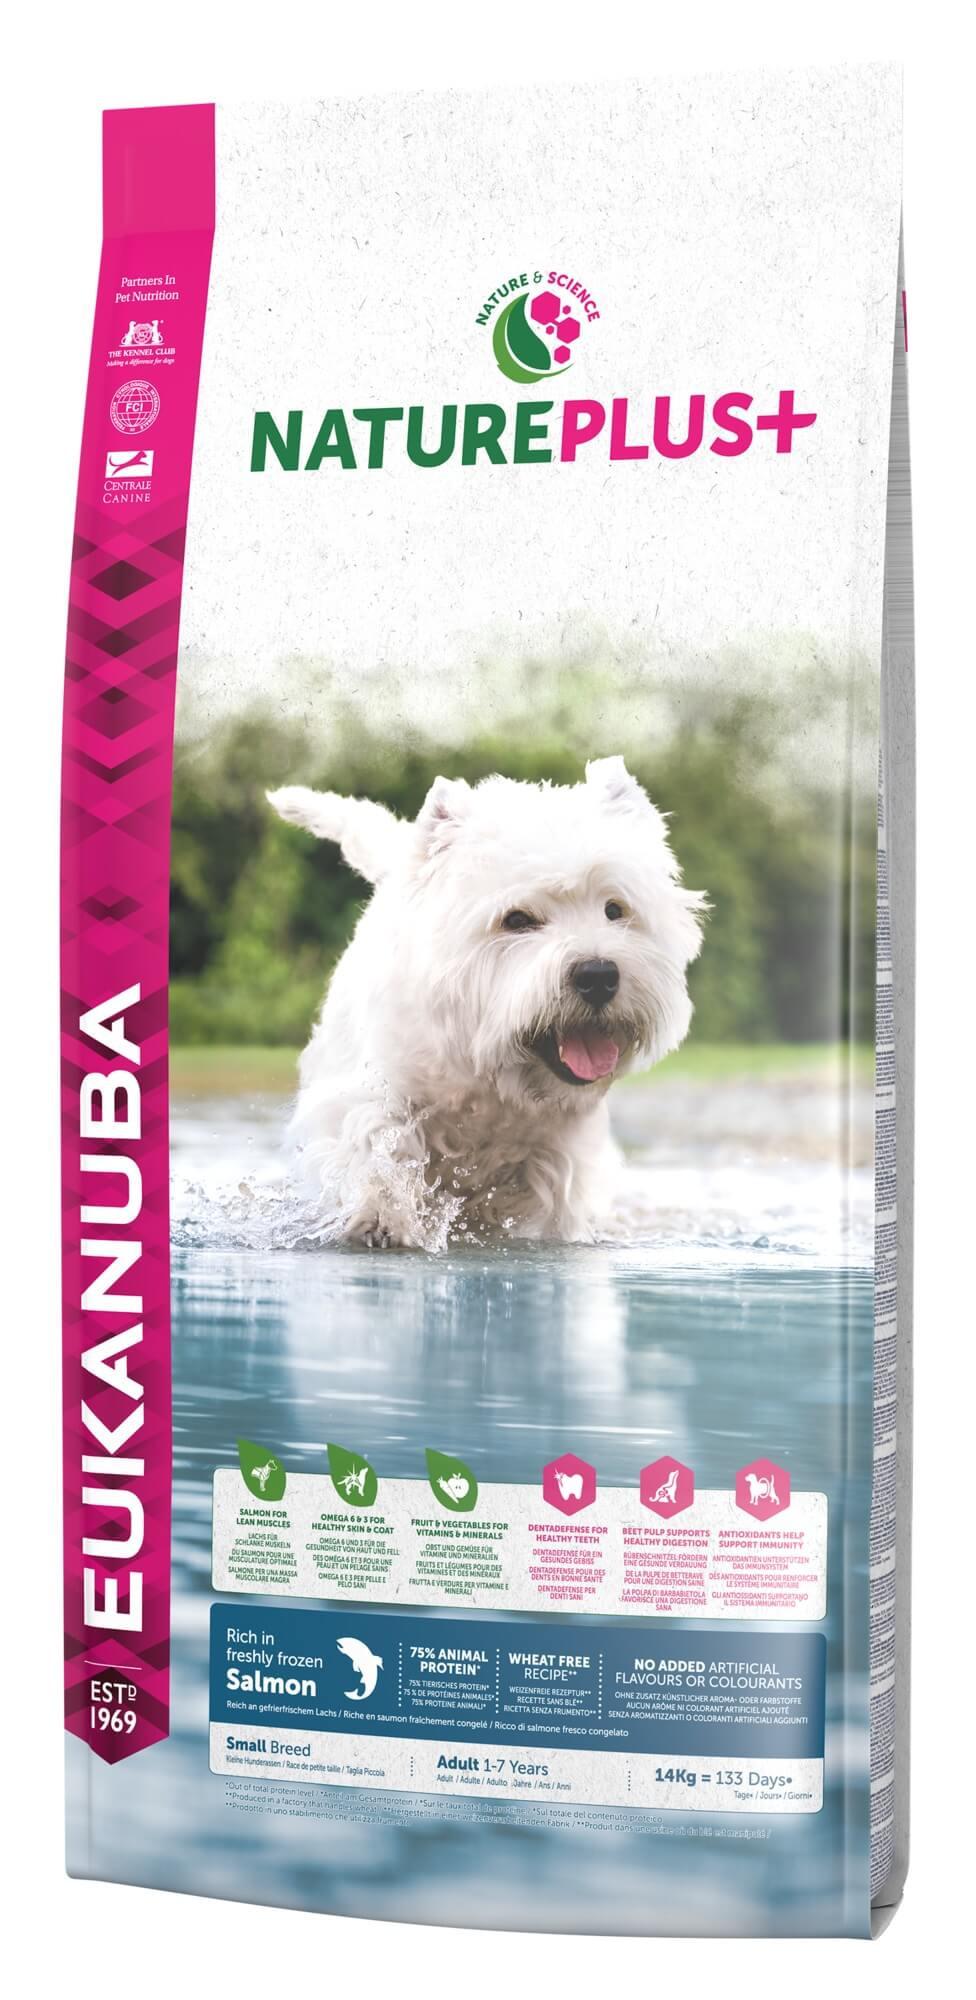 Eukanuba NaturePlus+ Adult Small Breed au saumon frais pour chien